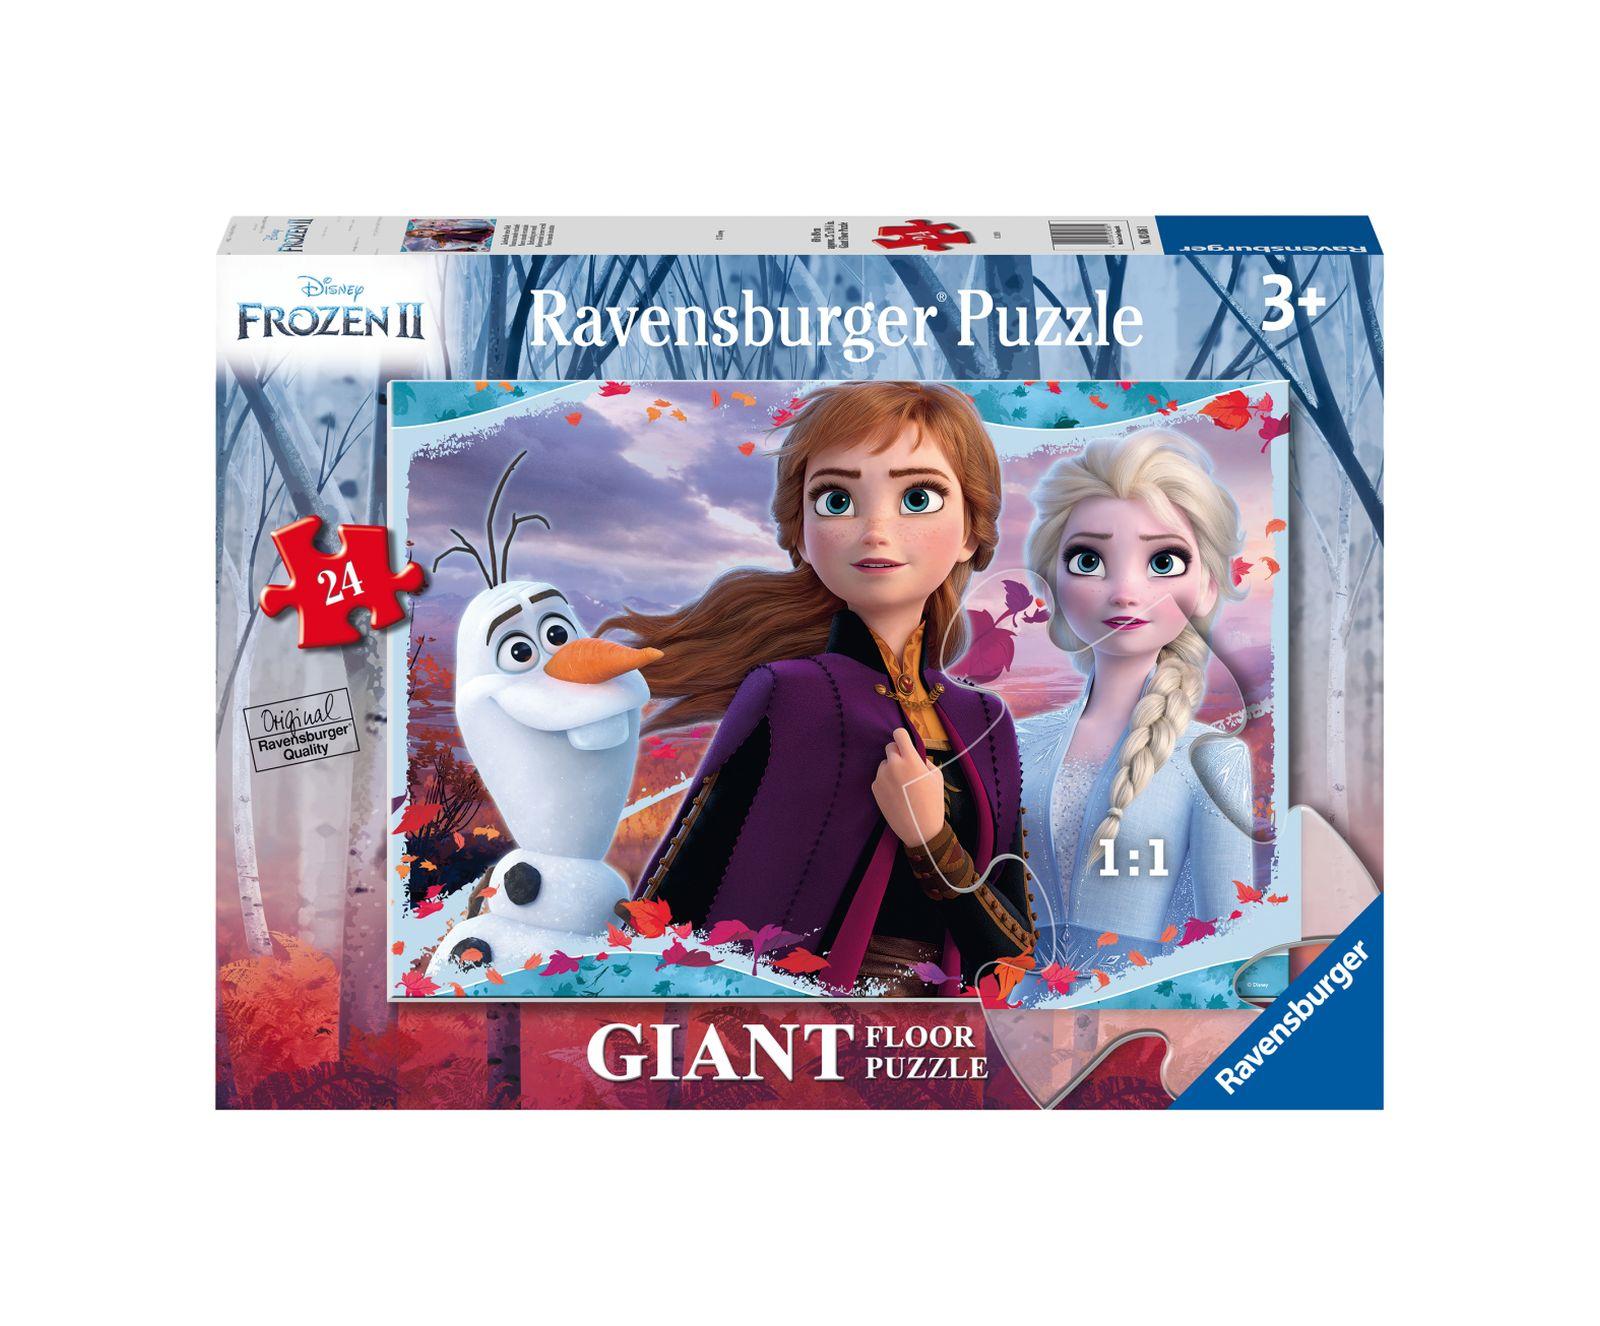 Ravensburger puzzle 24 pezzi giant frozen 2 - Ravensburger1